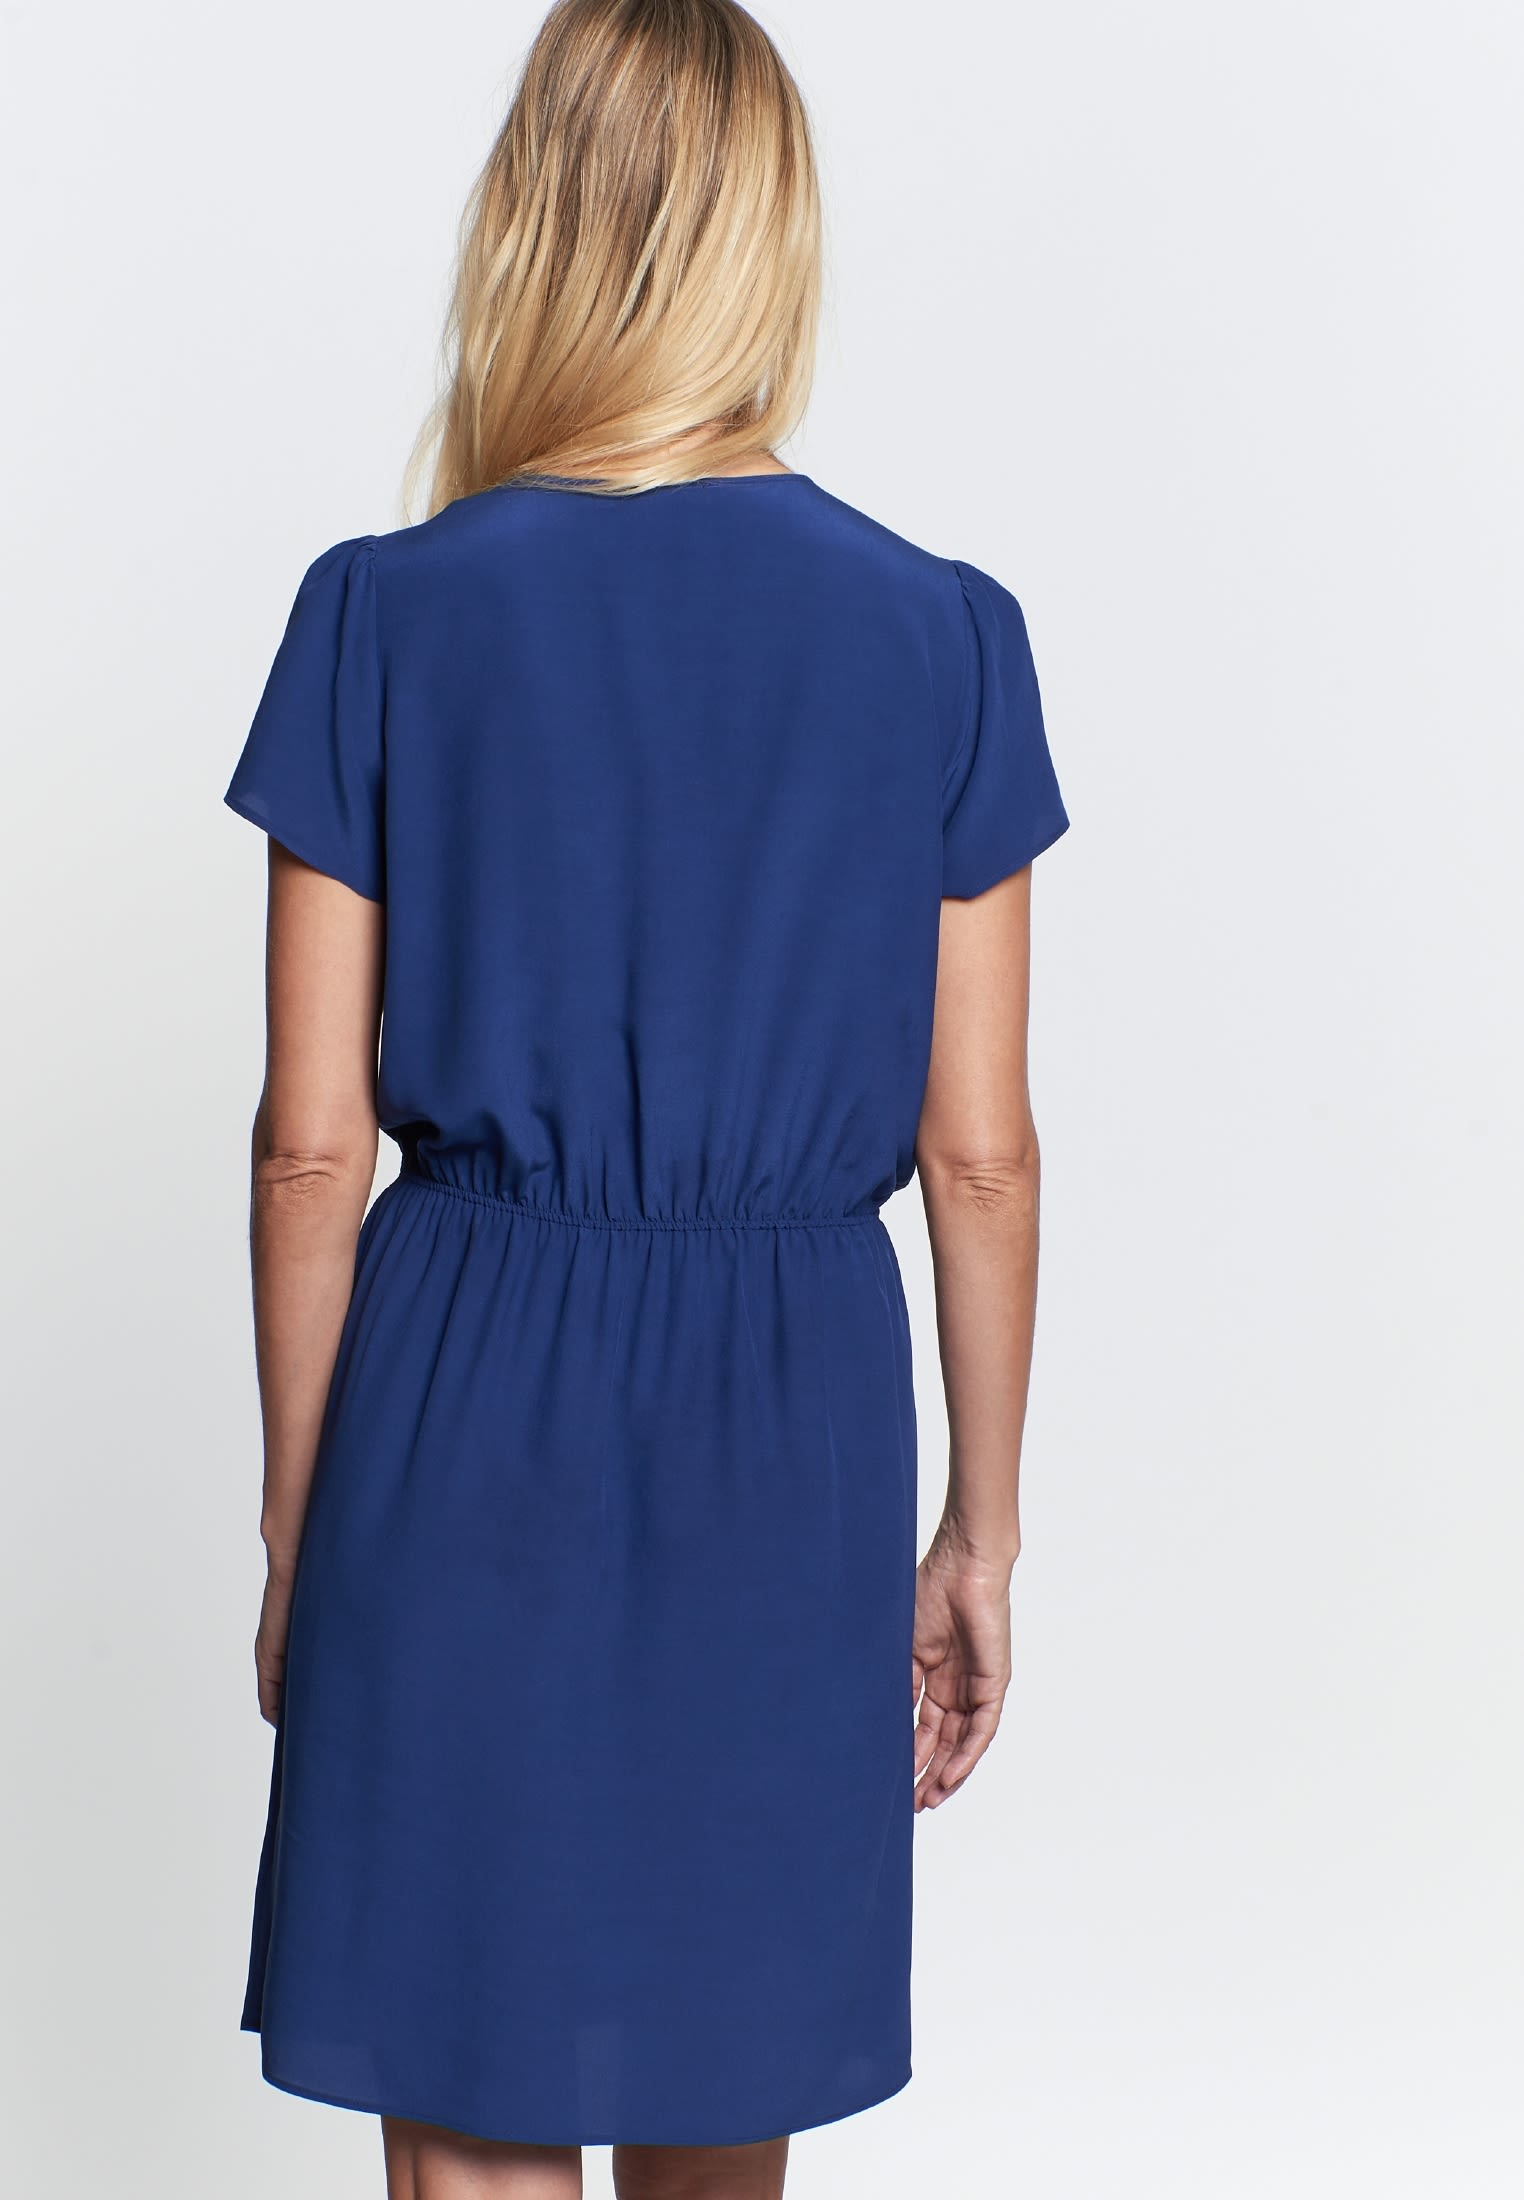 Crepe Midi Dress made of 100% Viscose in Medium blue |  Seidensticker Onlineshop